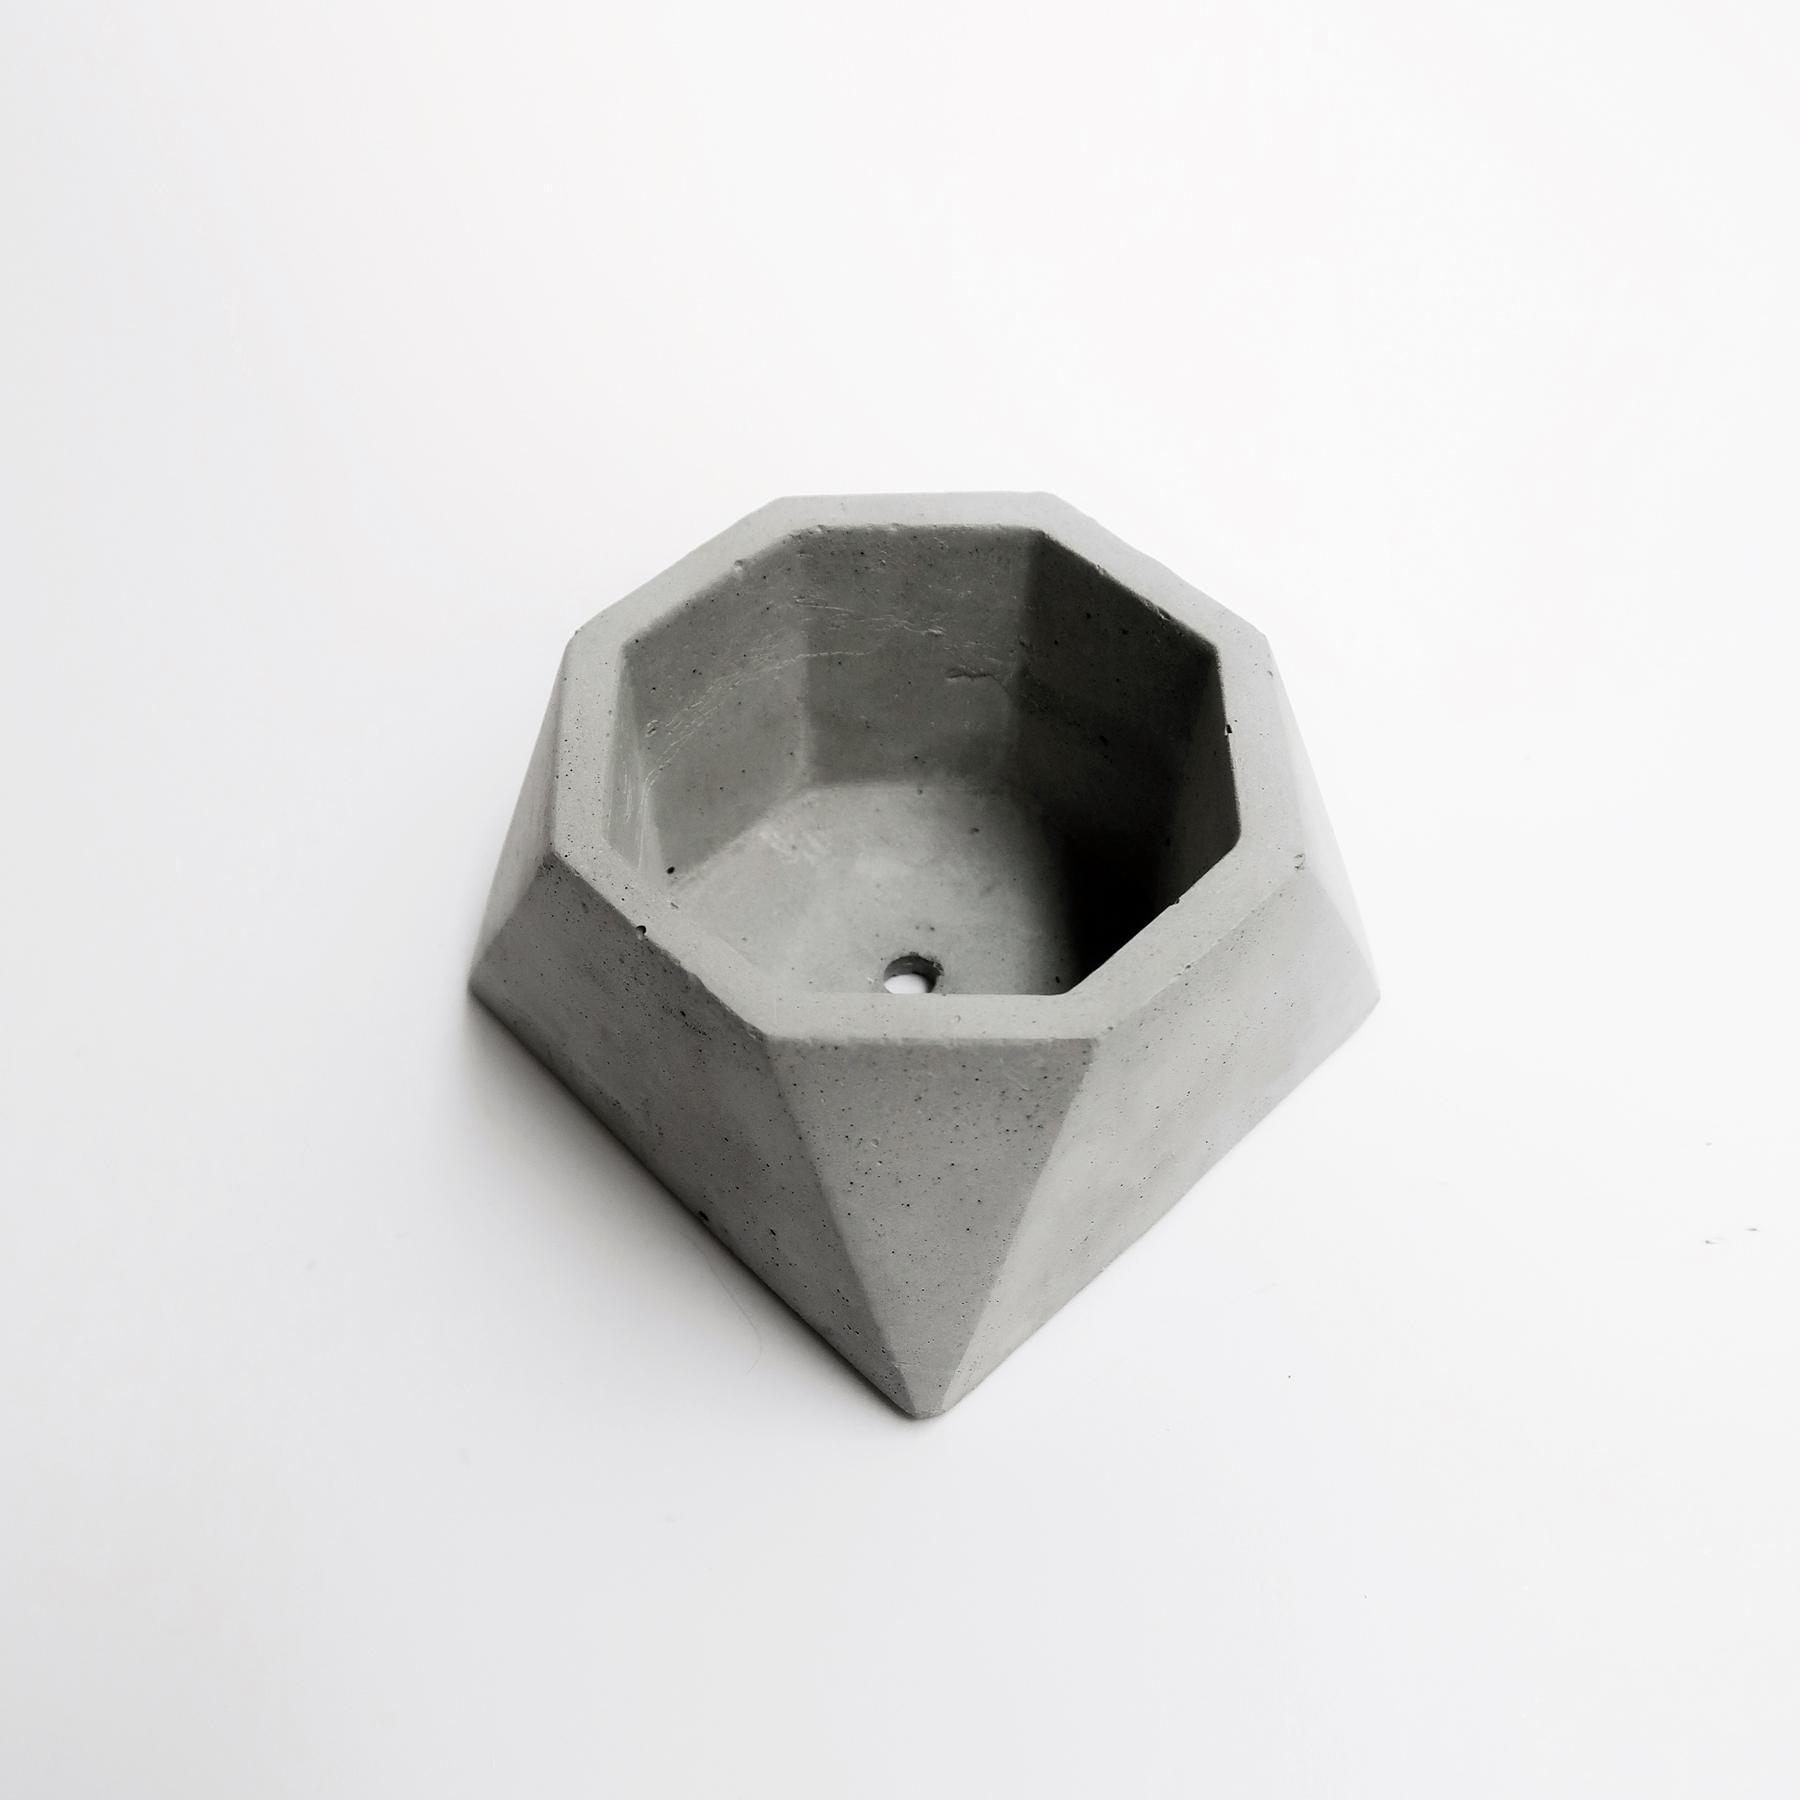 Concrete Design 幾何水泥設計盆器・居家擺飾・家飾盆栽